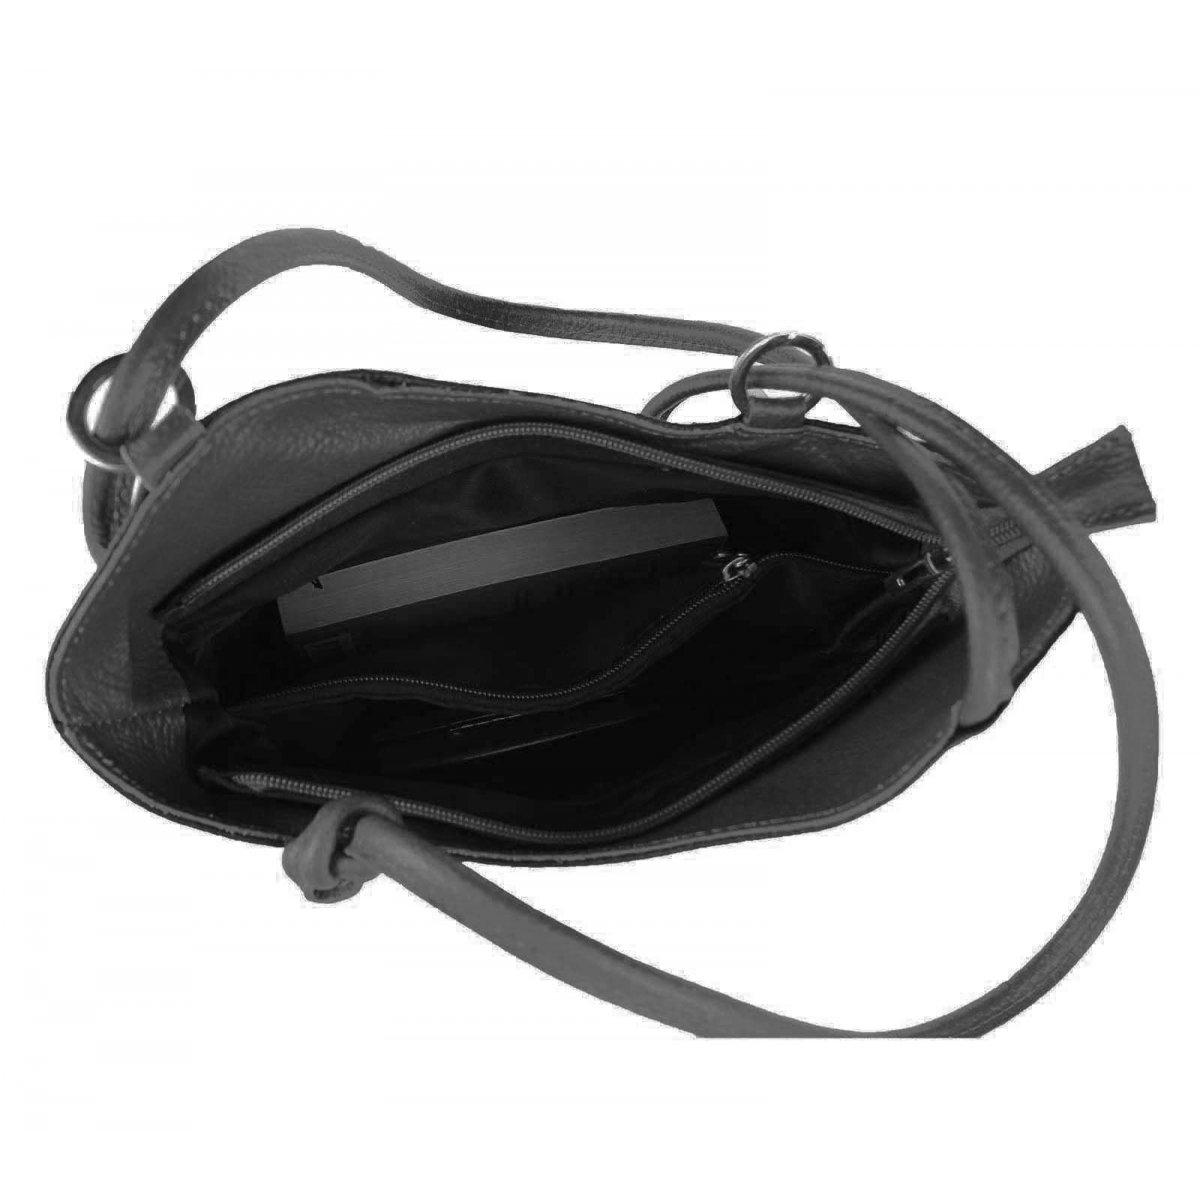 ital damen echt leder rucksack handtasche schultertasche 77 84 aud. Black Bedroom Furniture Sets. Home Design Ideas